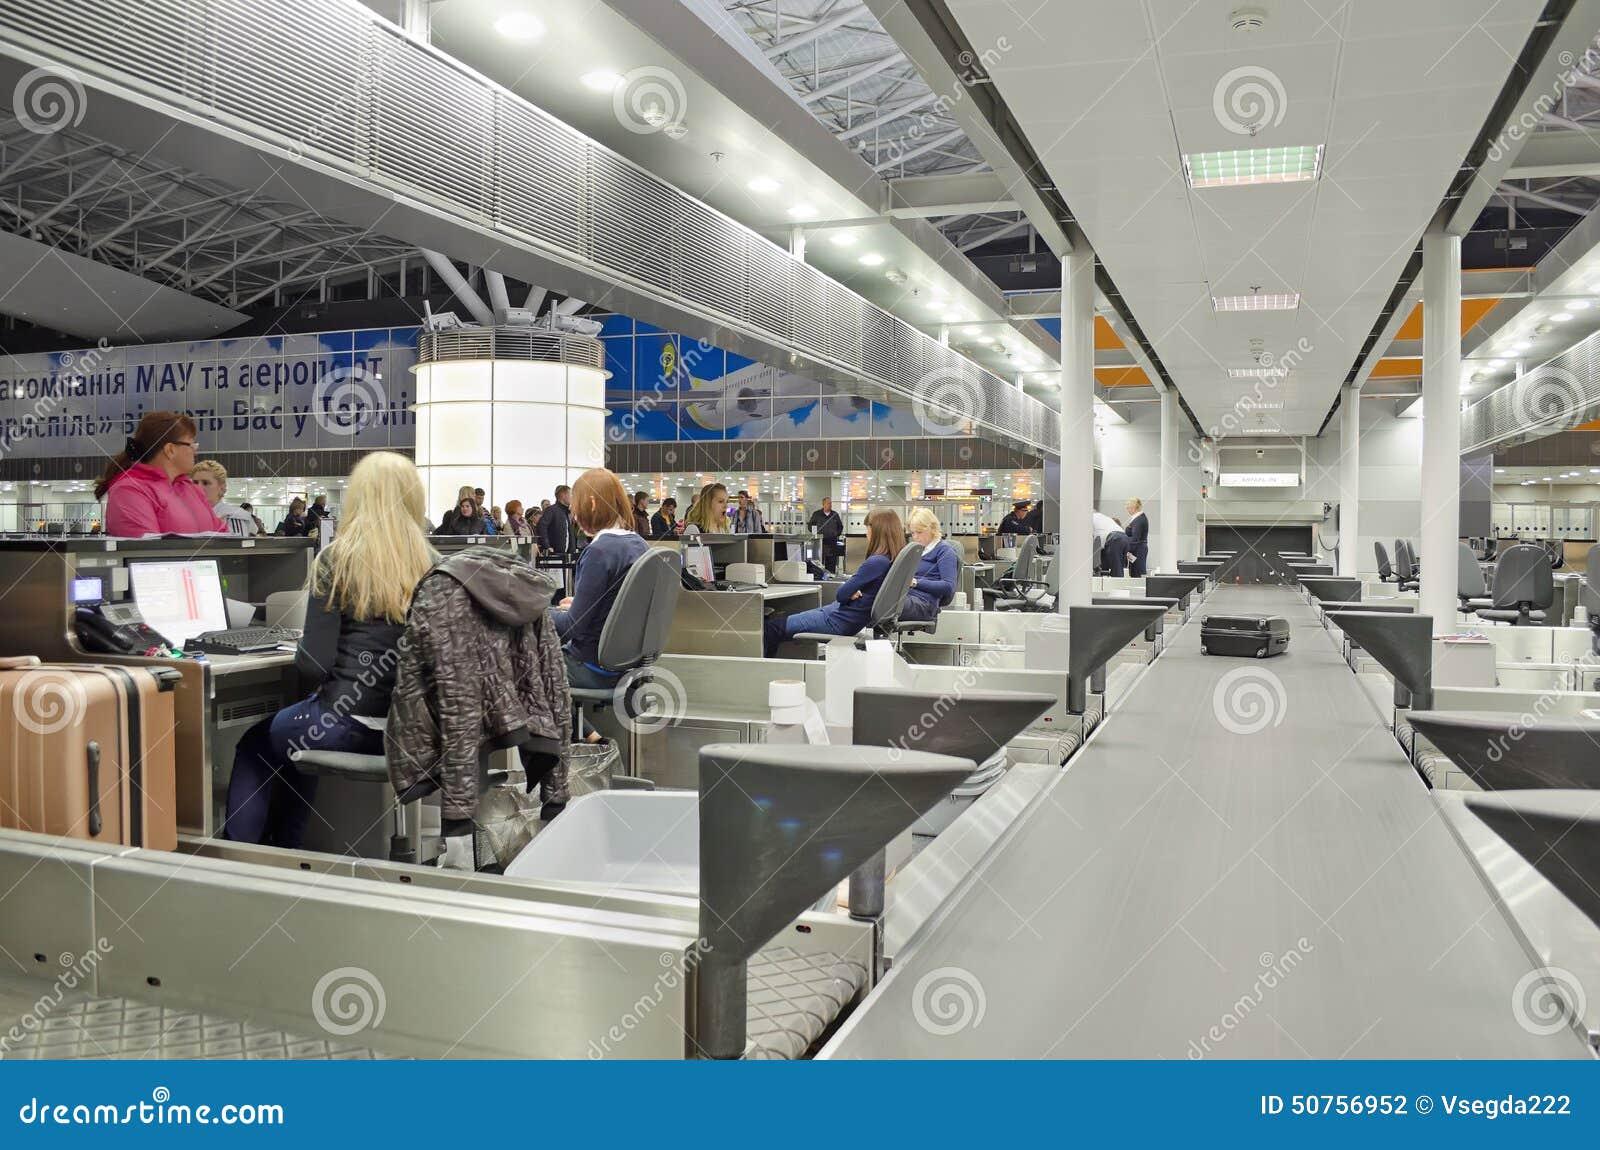 Aeroporto Kiev : Kiev borispol airport editorial photography image of airport